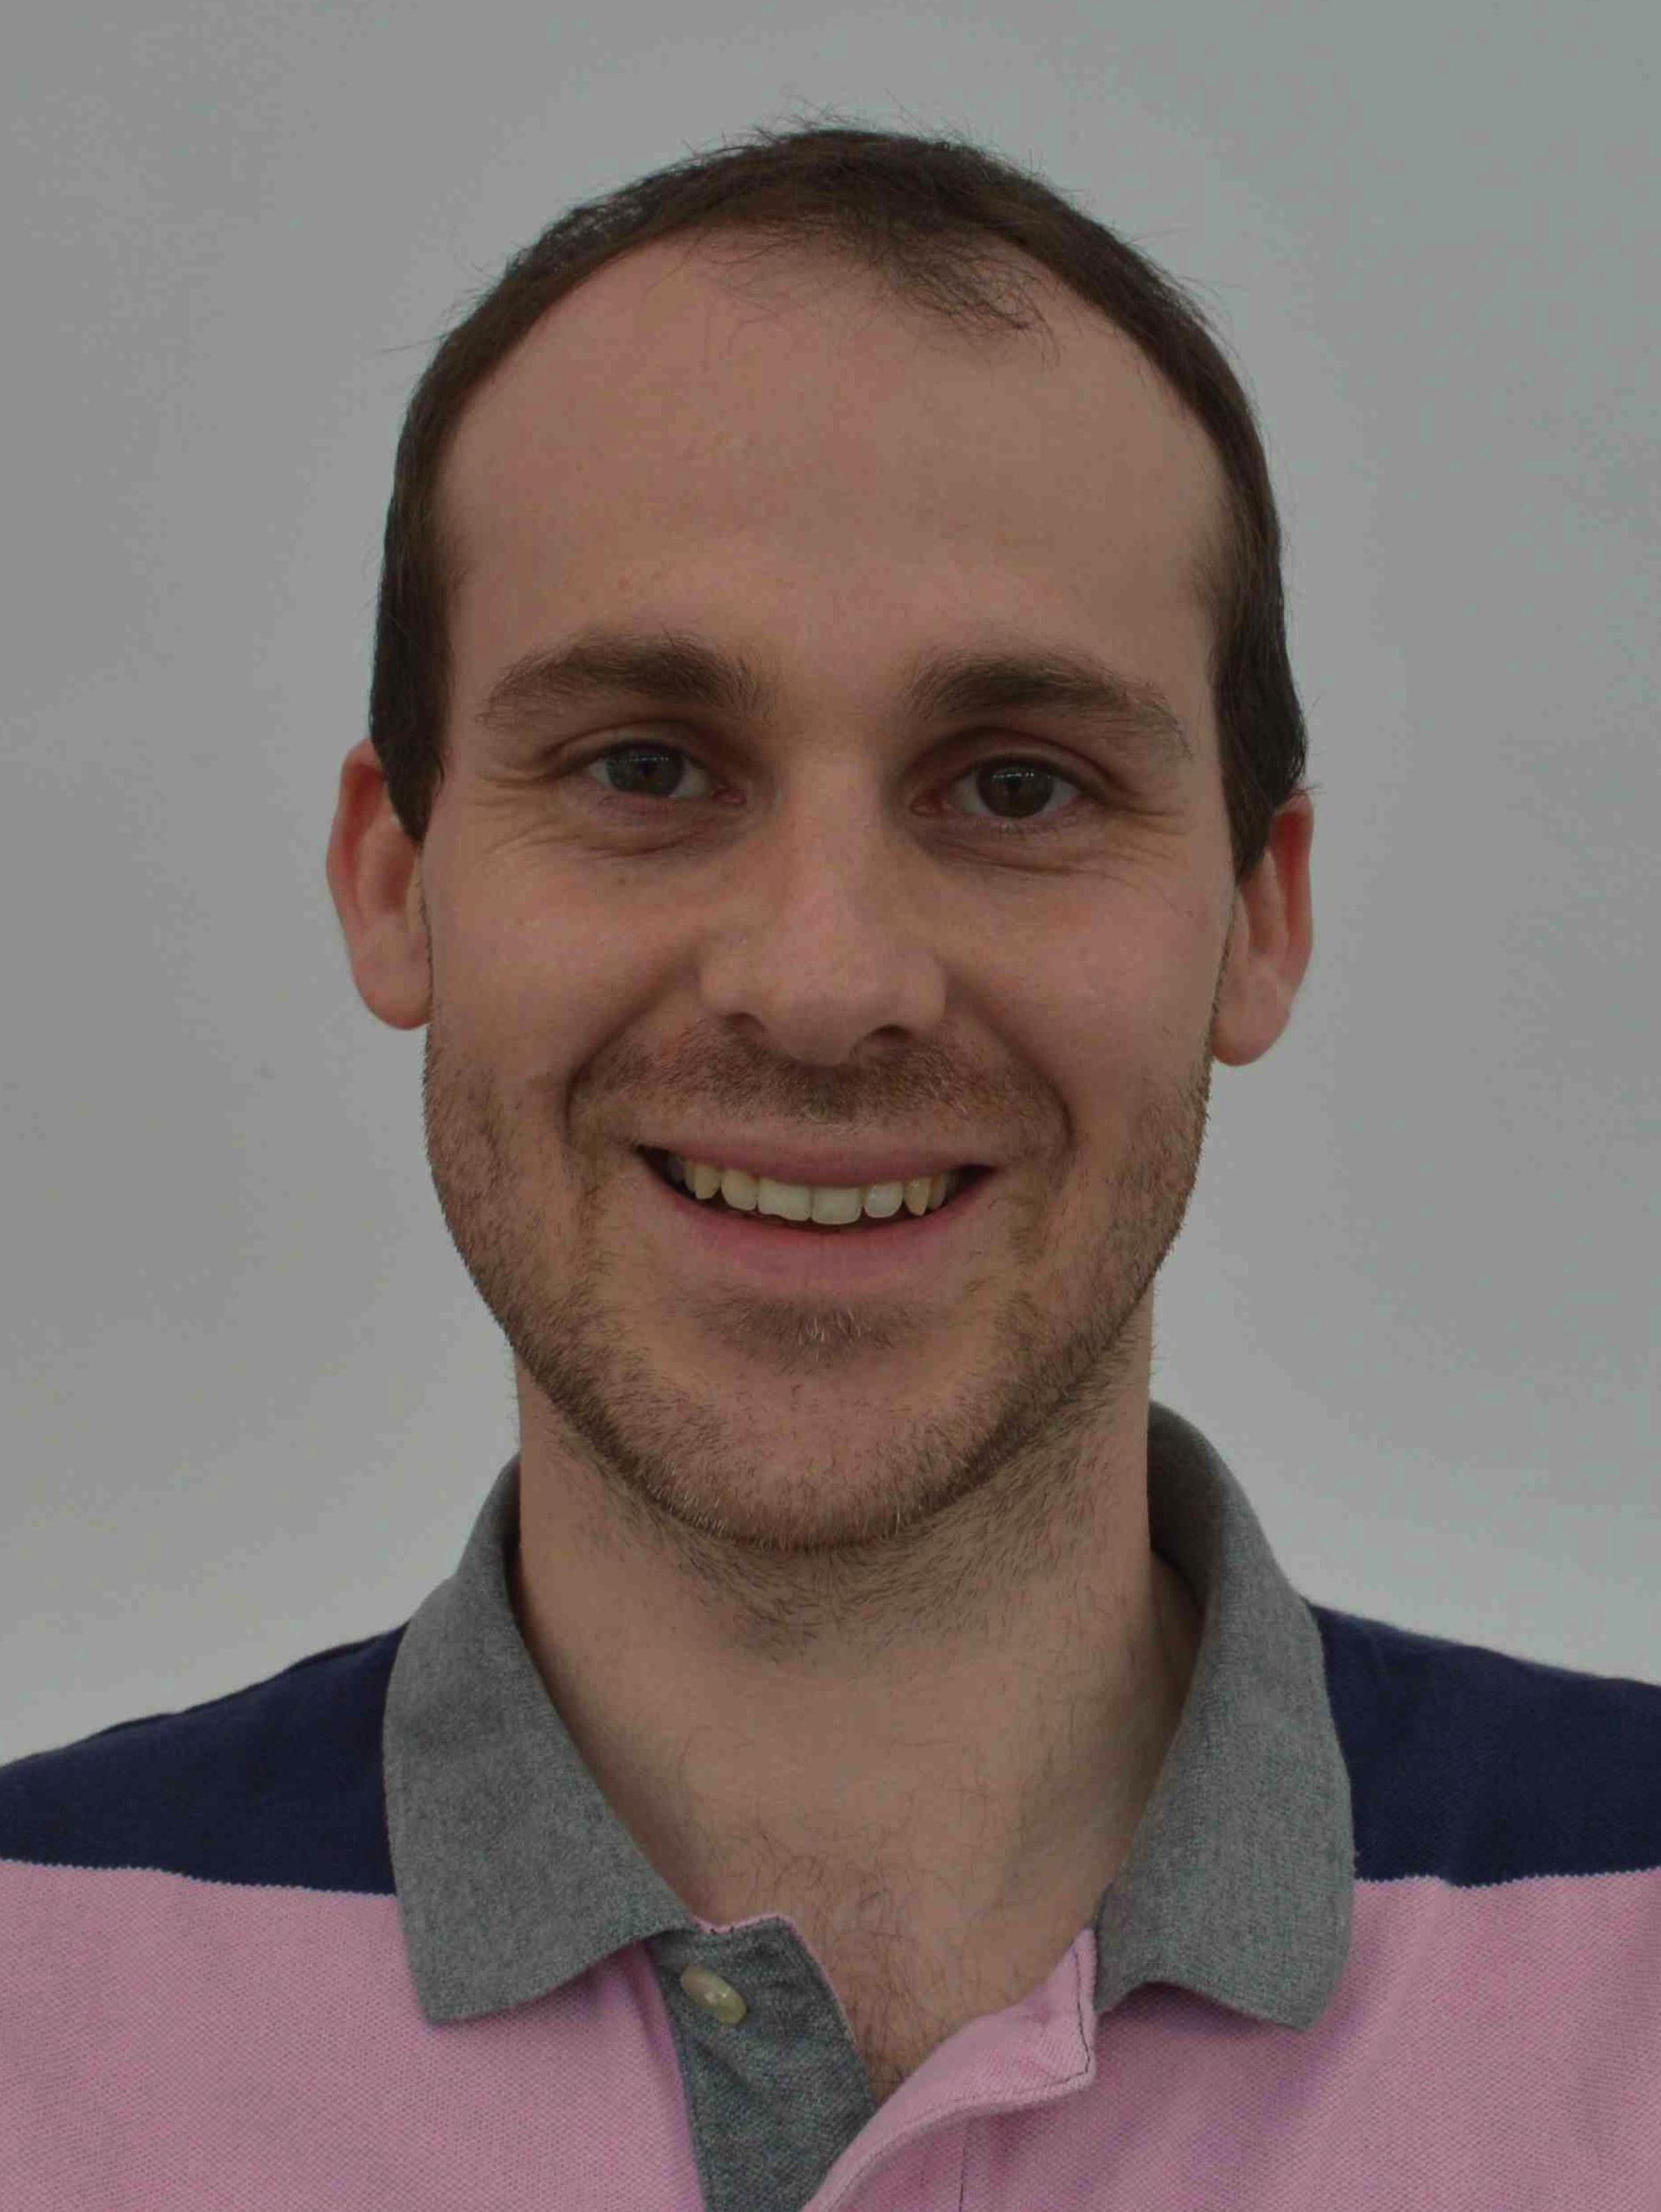 Simon Tual-Chalot, PhD